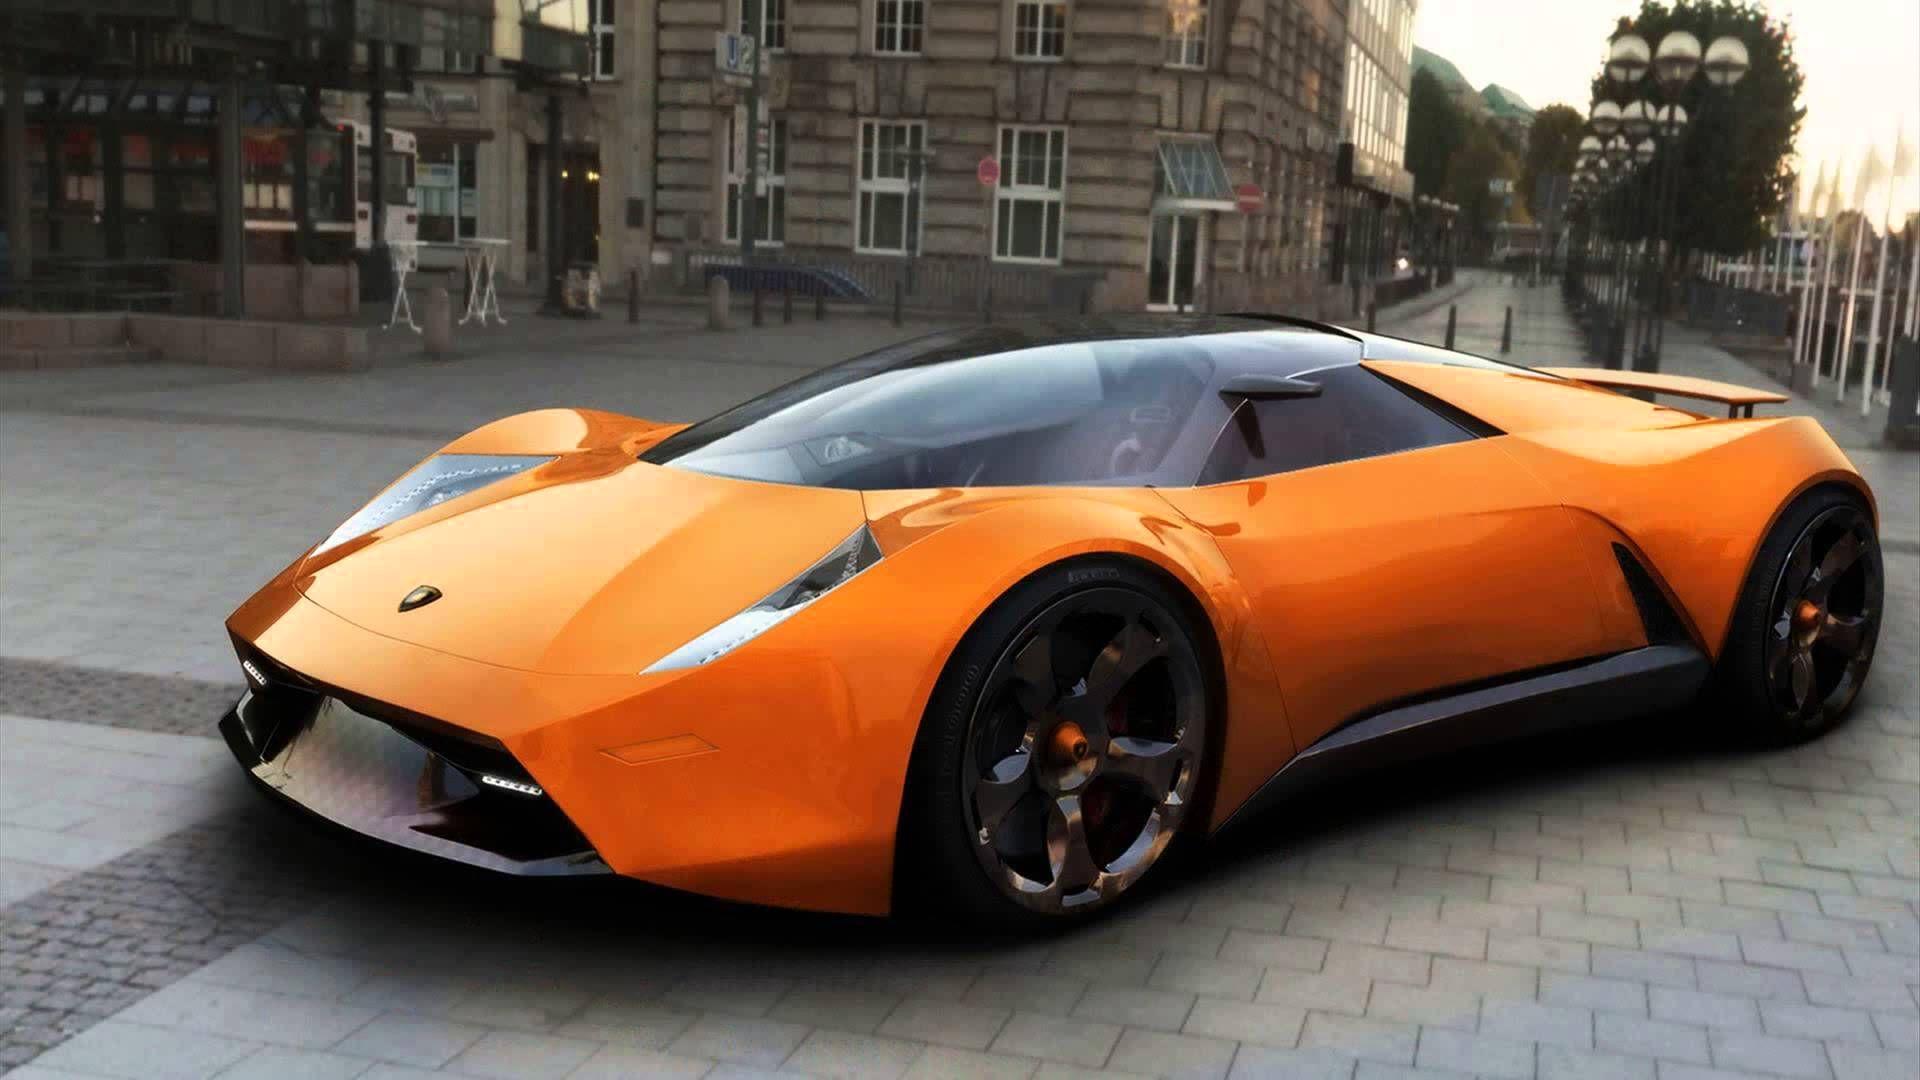 adriano raeli ferrari f80 hybrid concept 2015 model   ferrari--vol